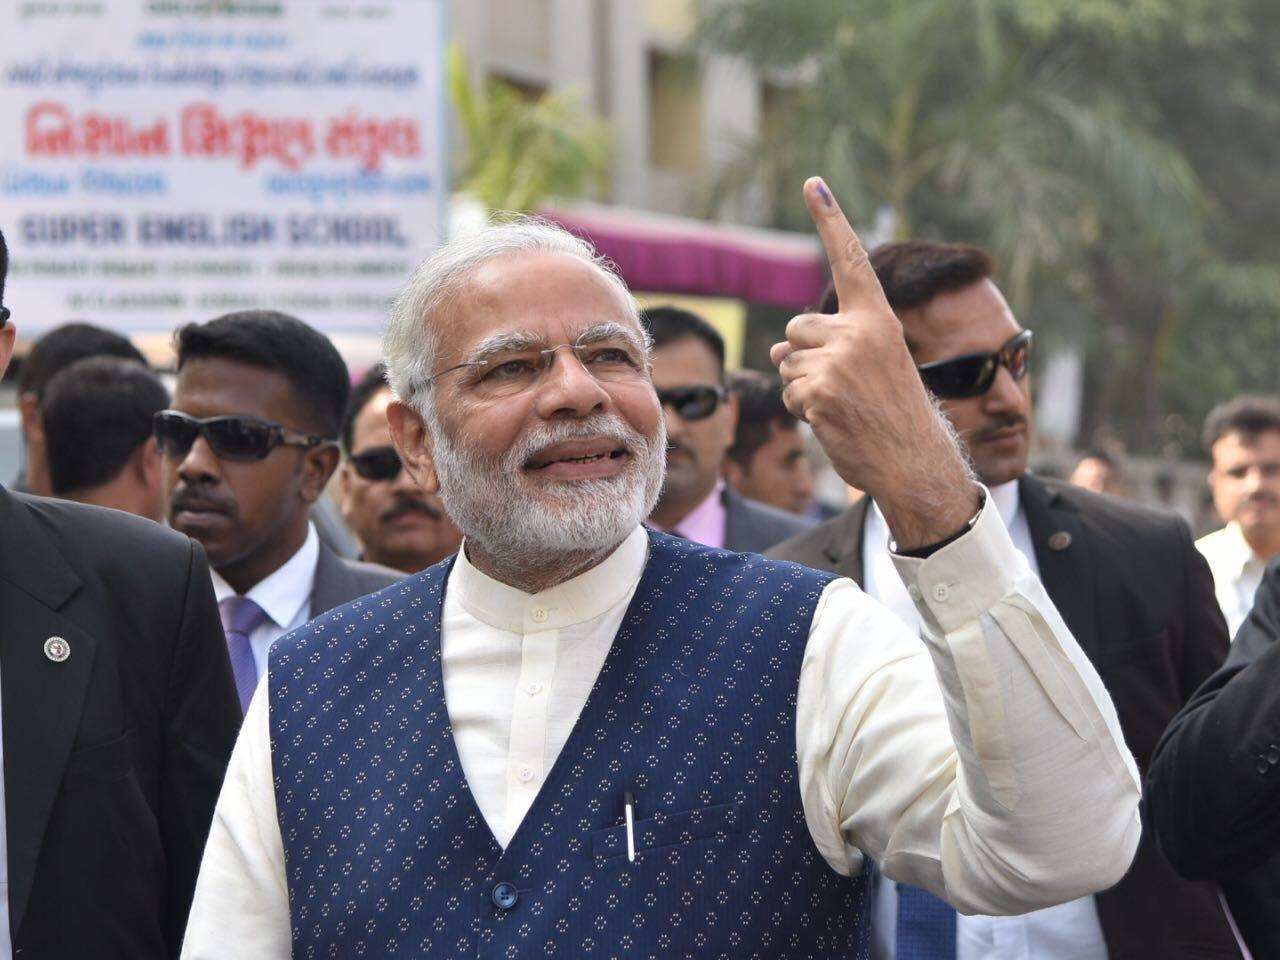 Gujarat results 'zabardast jhatka' to BJP, says Rahul